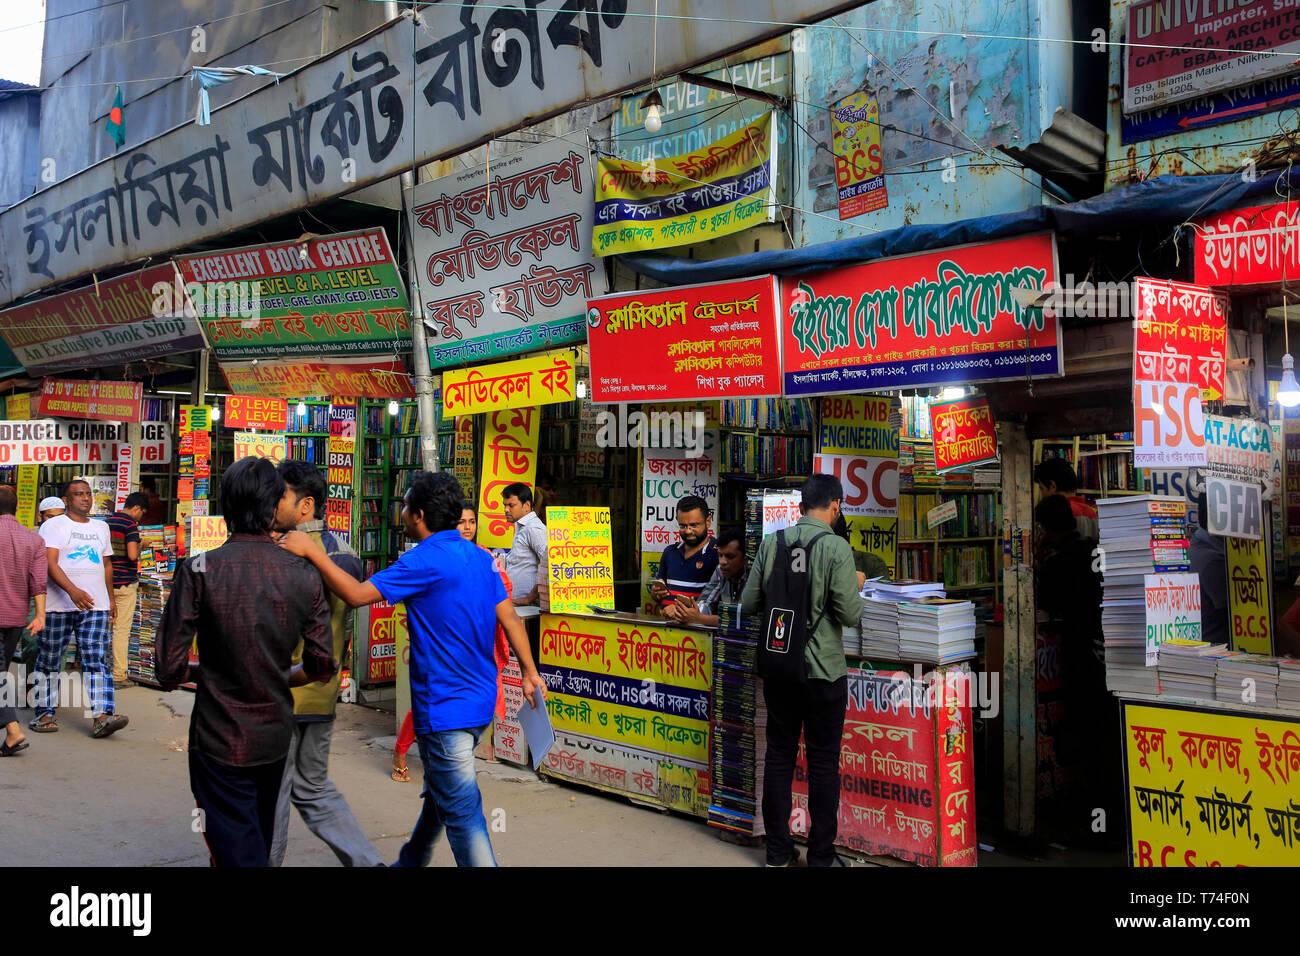 View of the Islamia Book Market at Nilkhet in Dhaka, Bangladesh - Stock Image